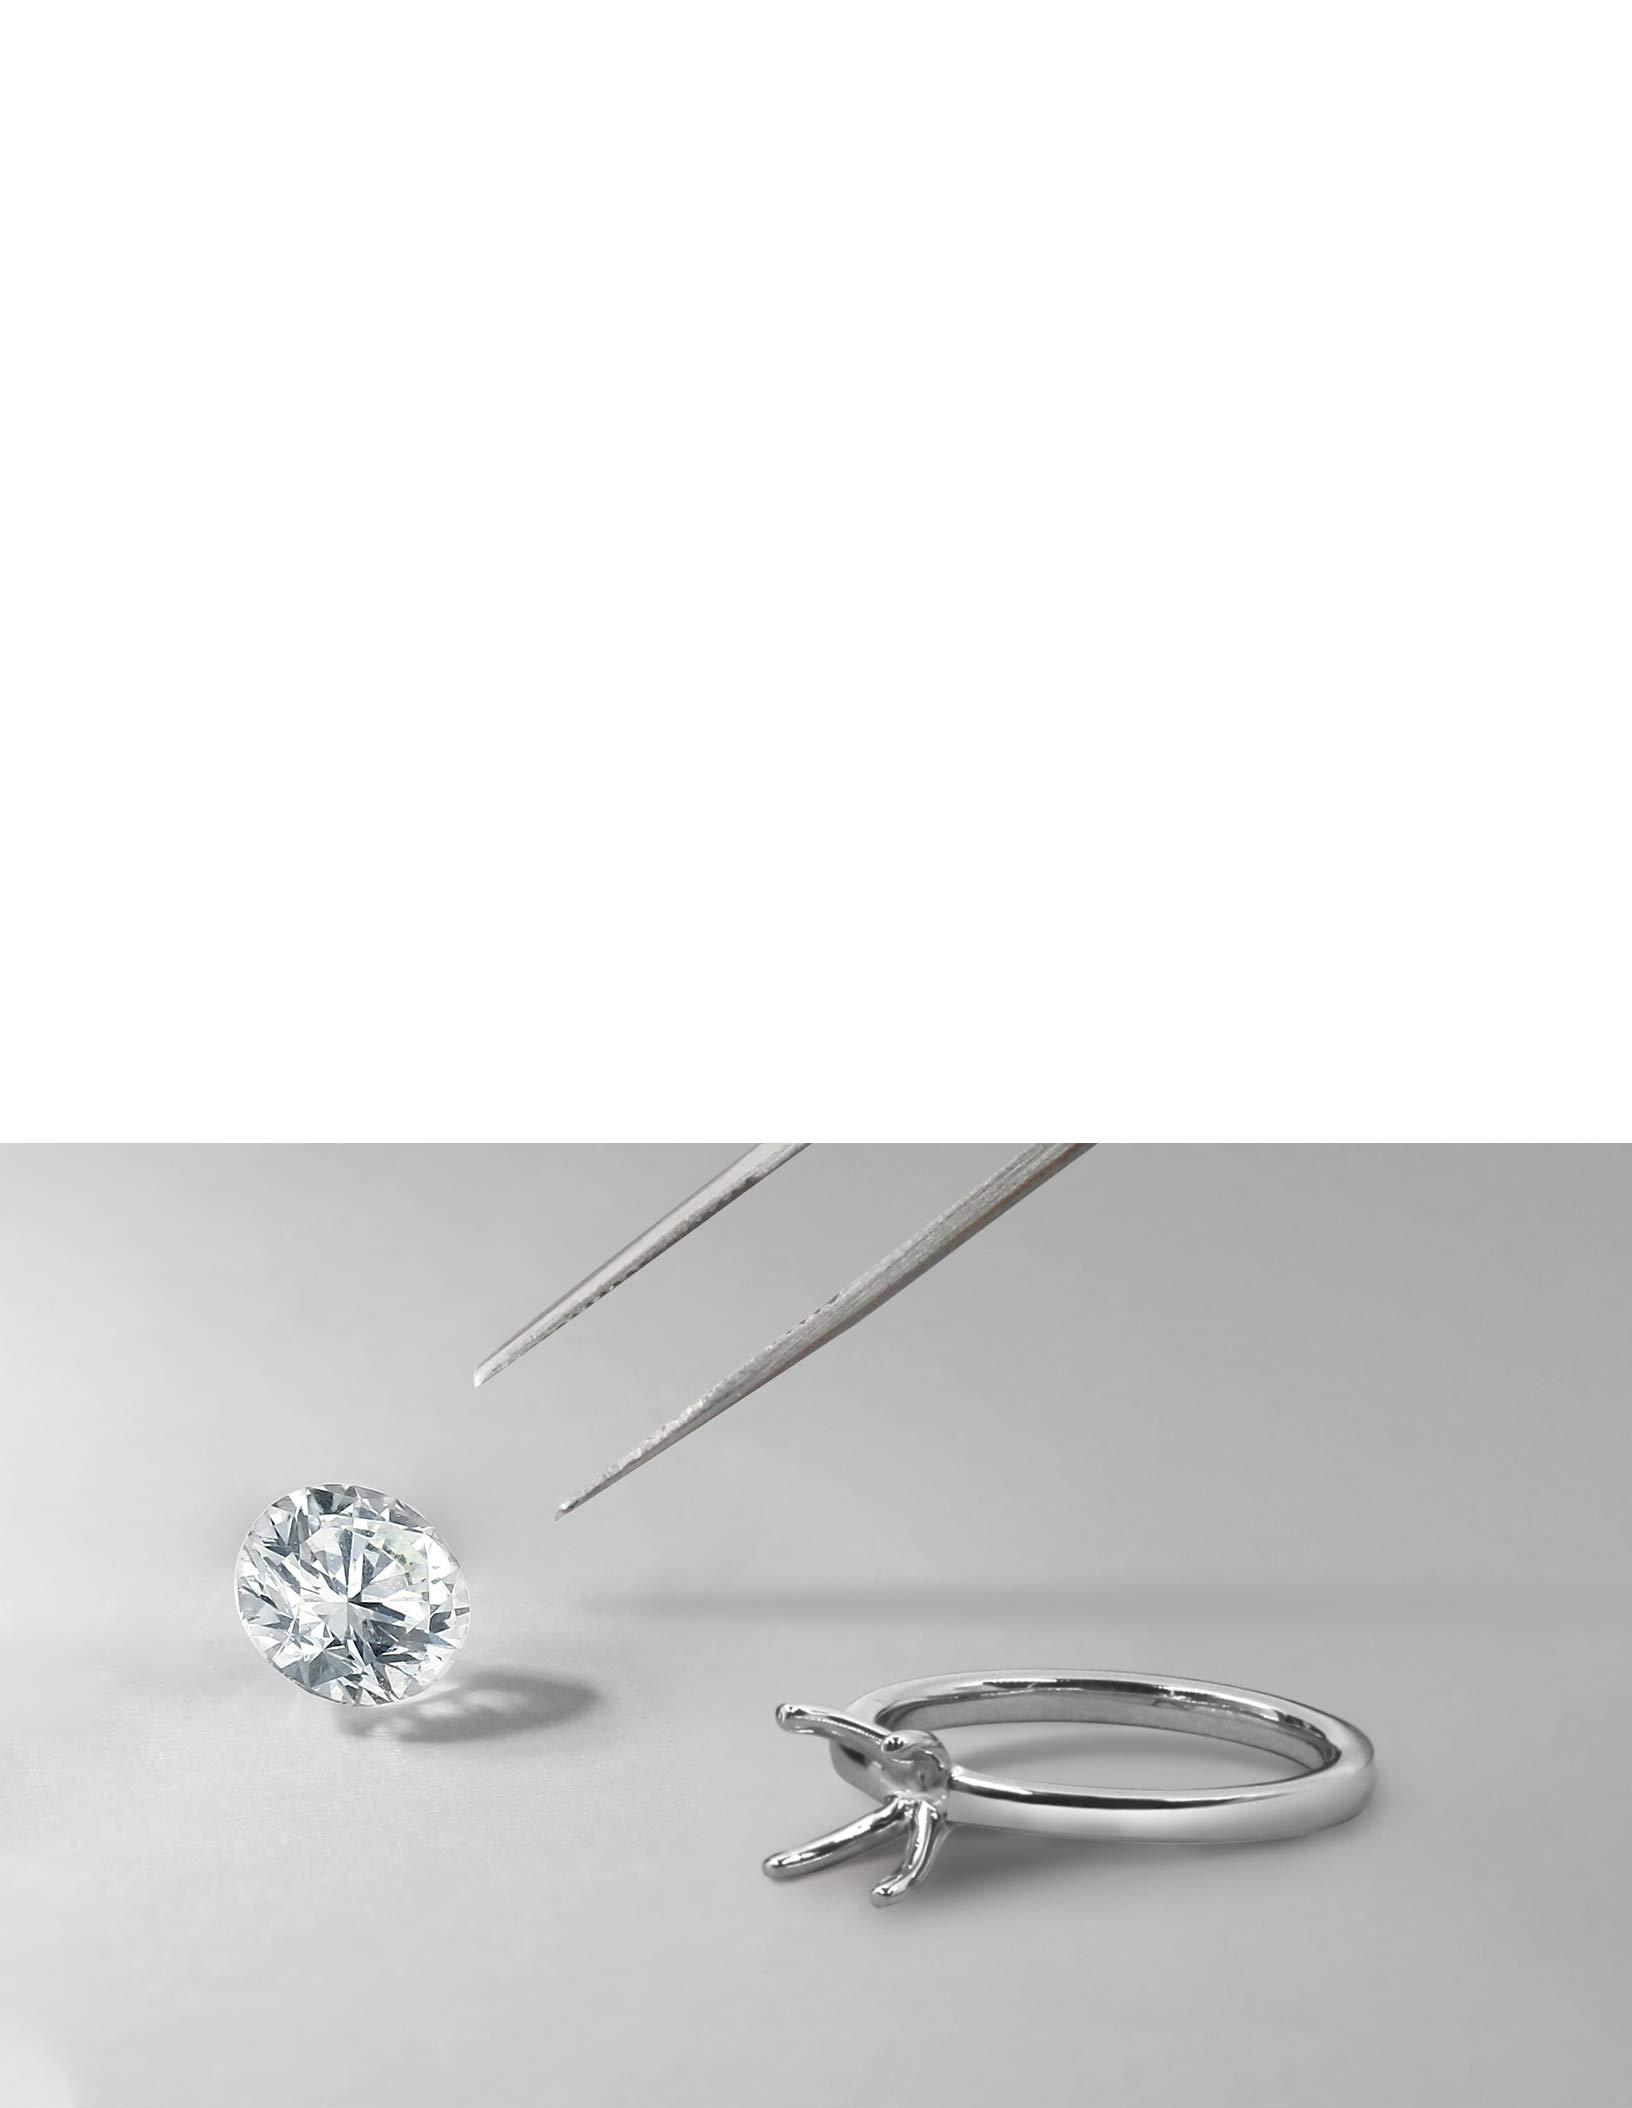 Platinum Emerald Cut Engagement Rings - Steven Stone